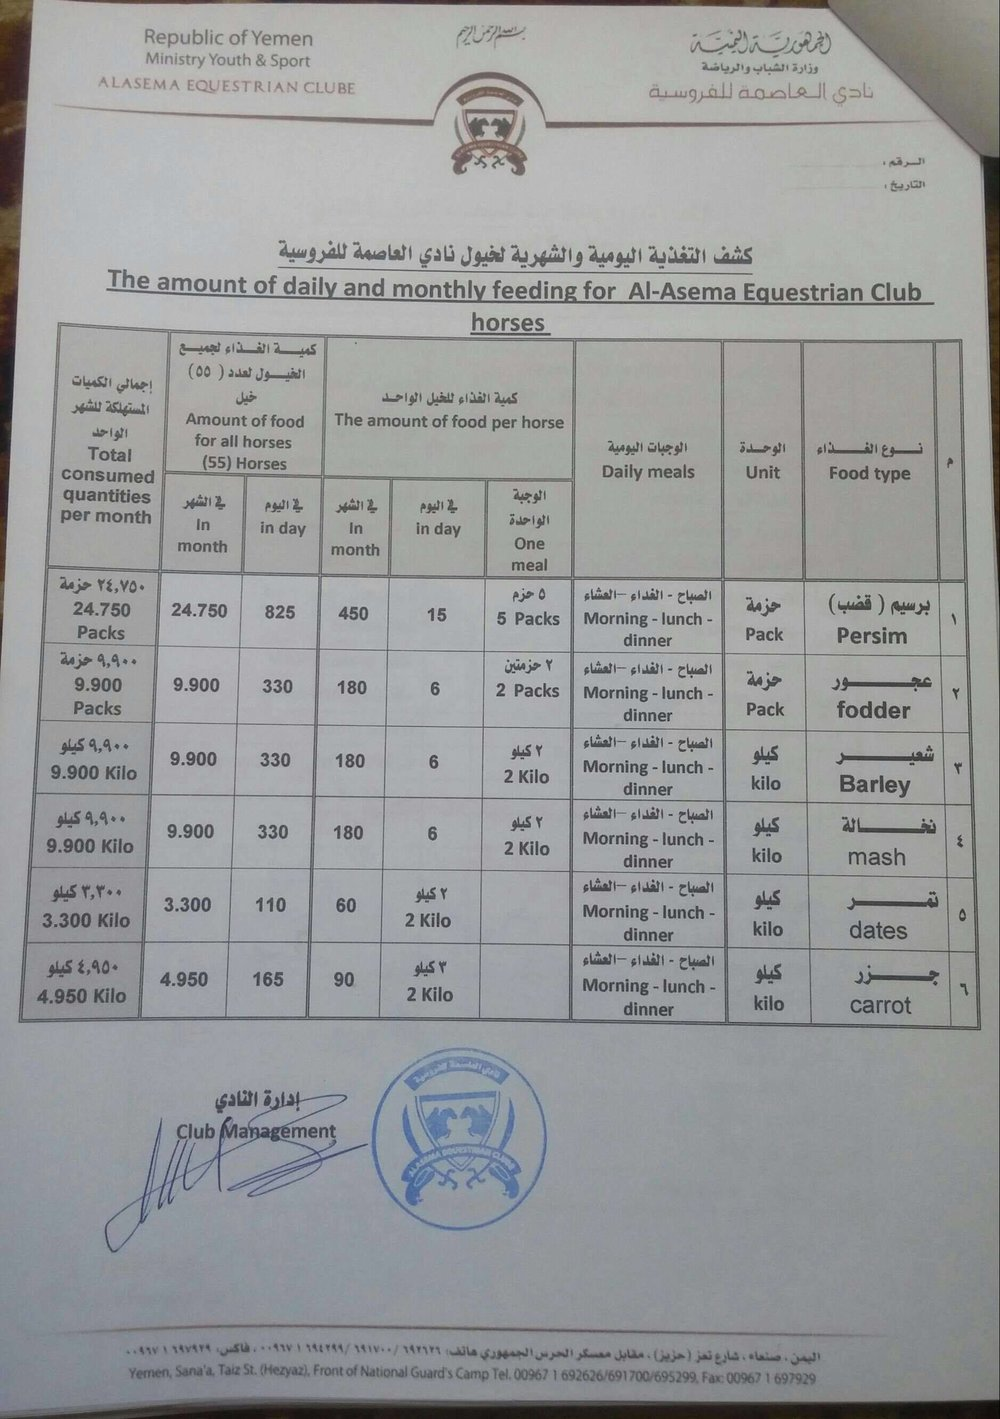 Arabian Horses Riding School Sana'a yemen to OWAP-AR 6 oct 2018 page 2.jpg